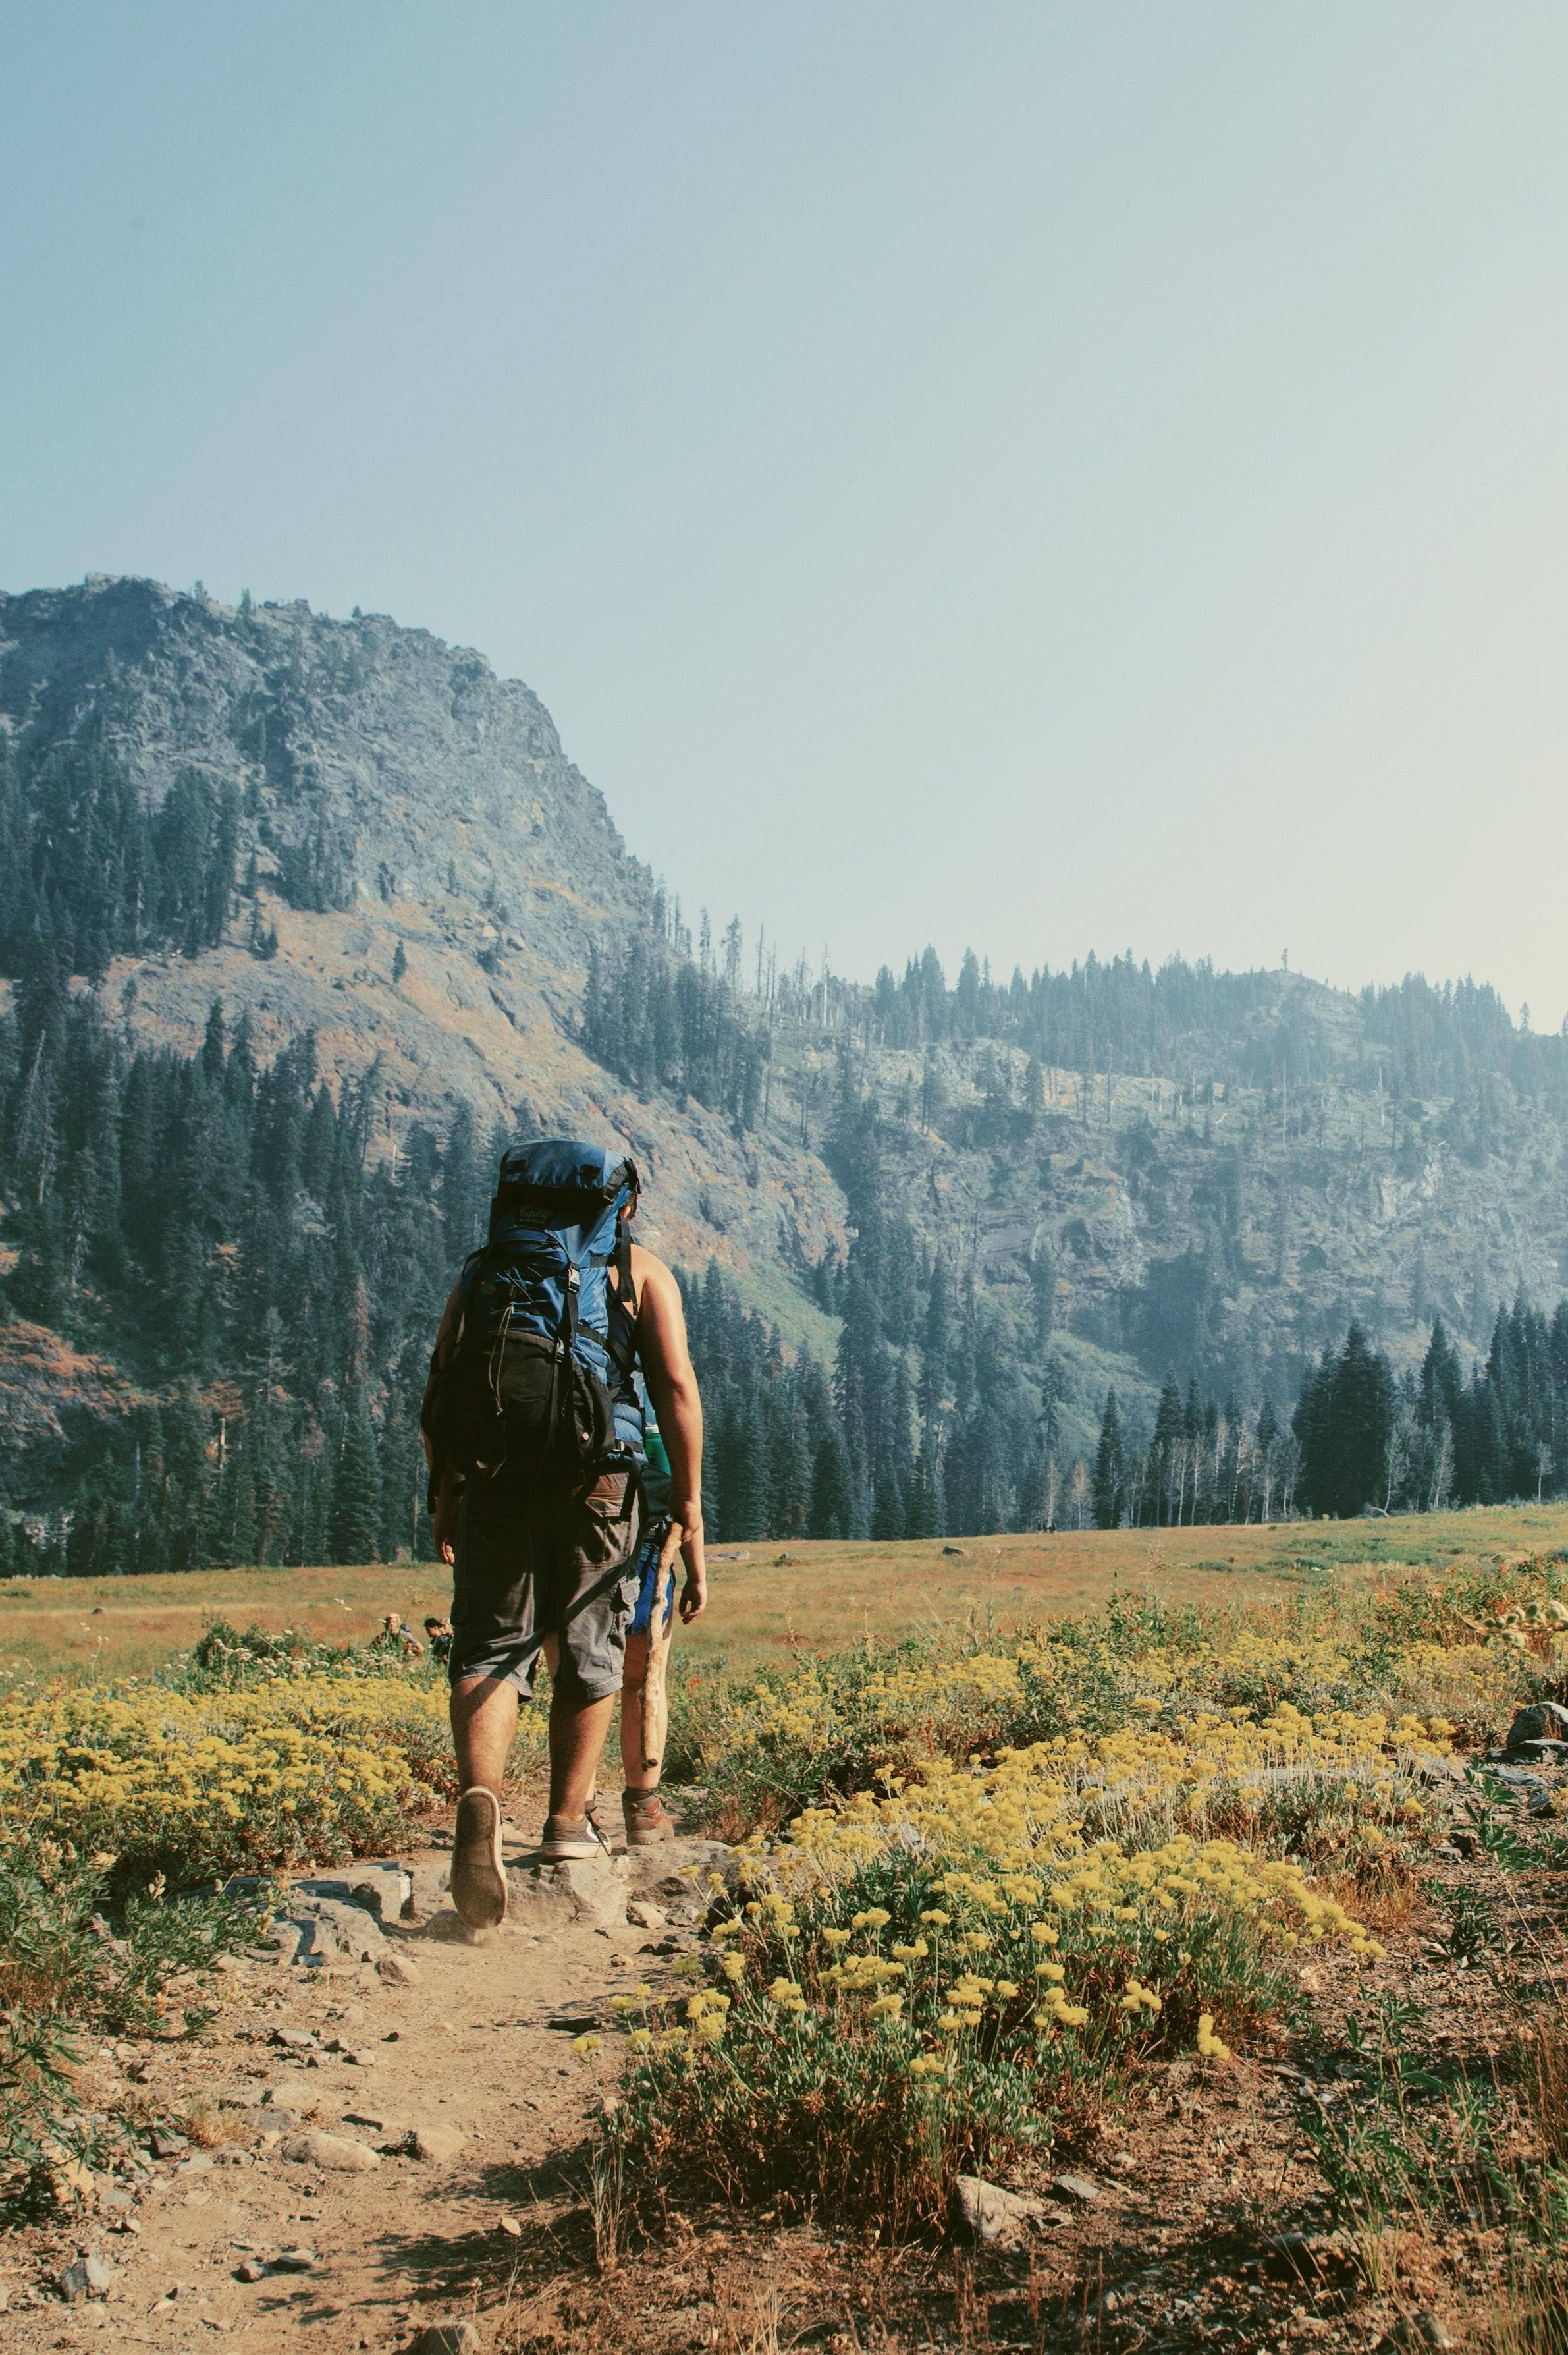 Put The Fun Back In Parenting California Camping Family Adventure Parenting